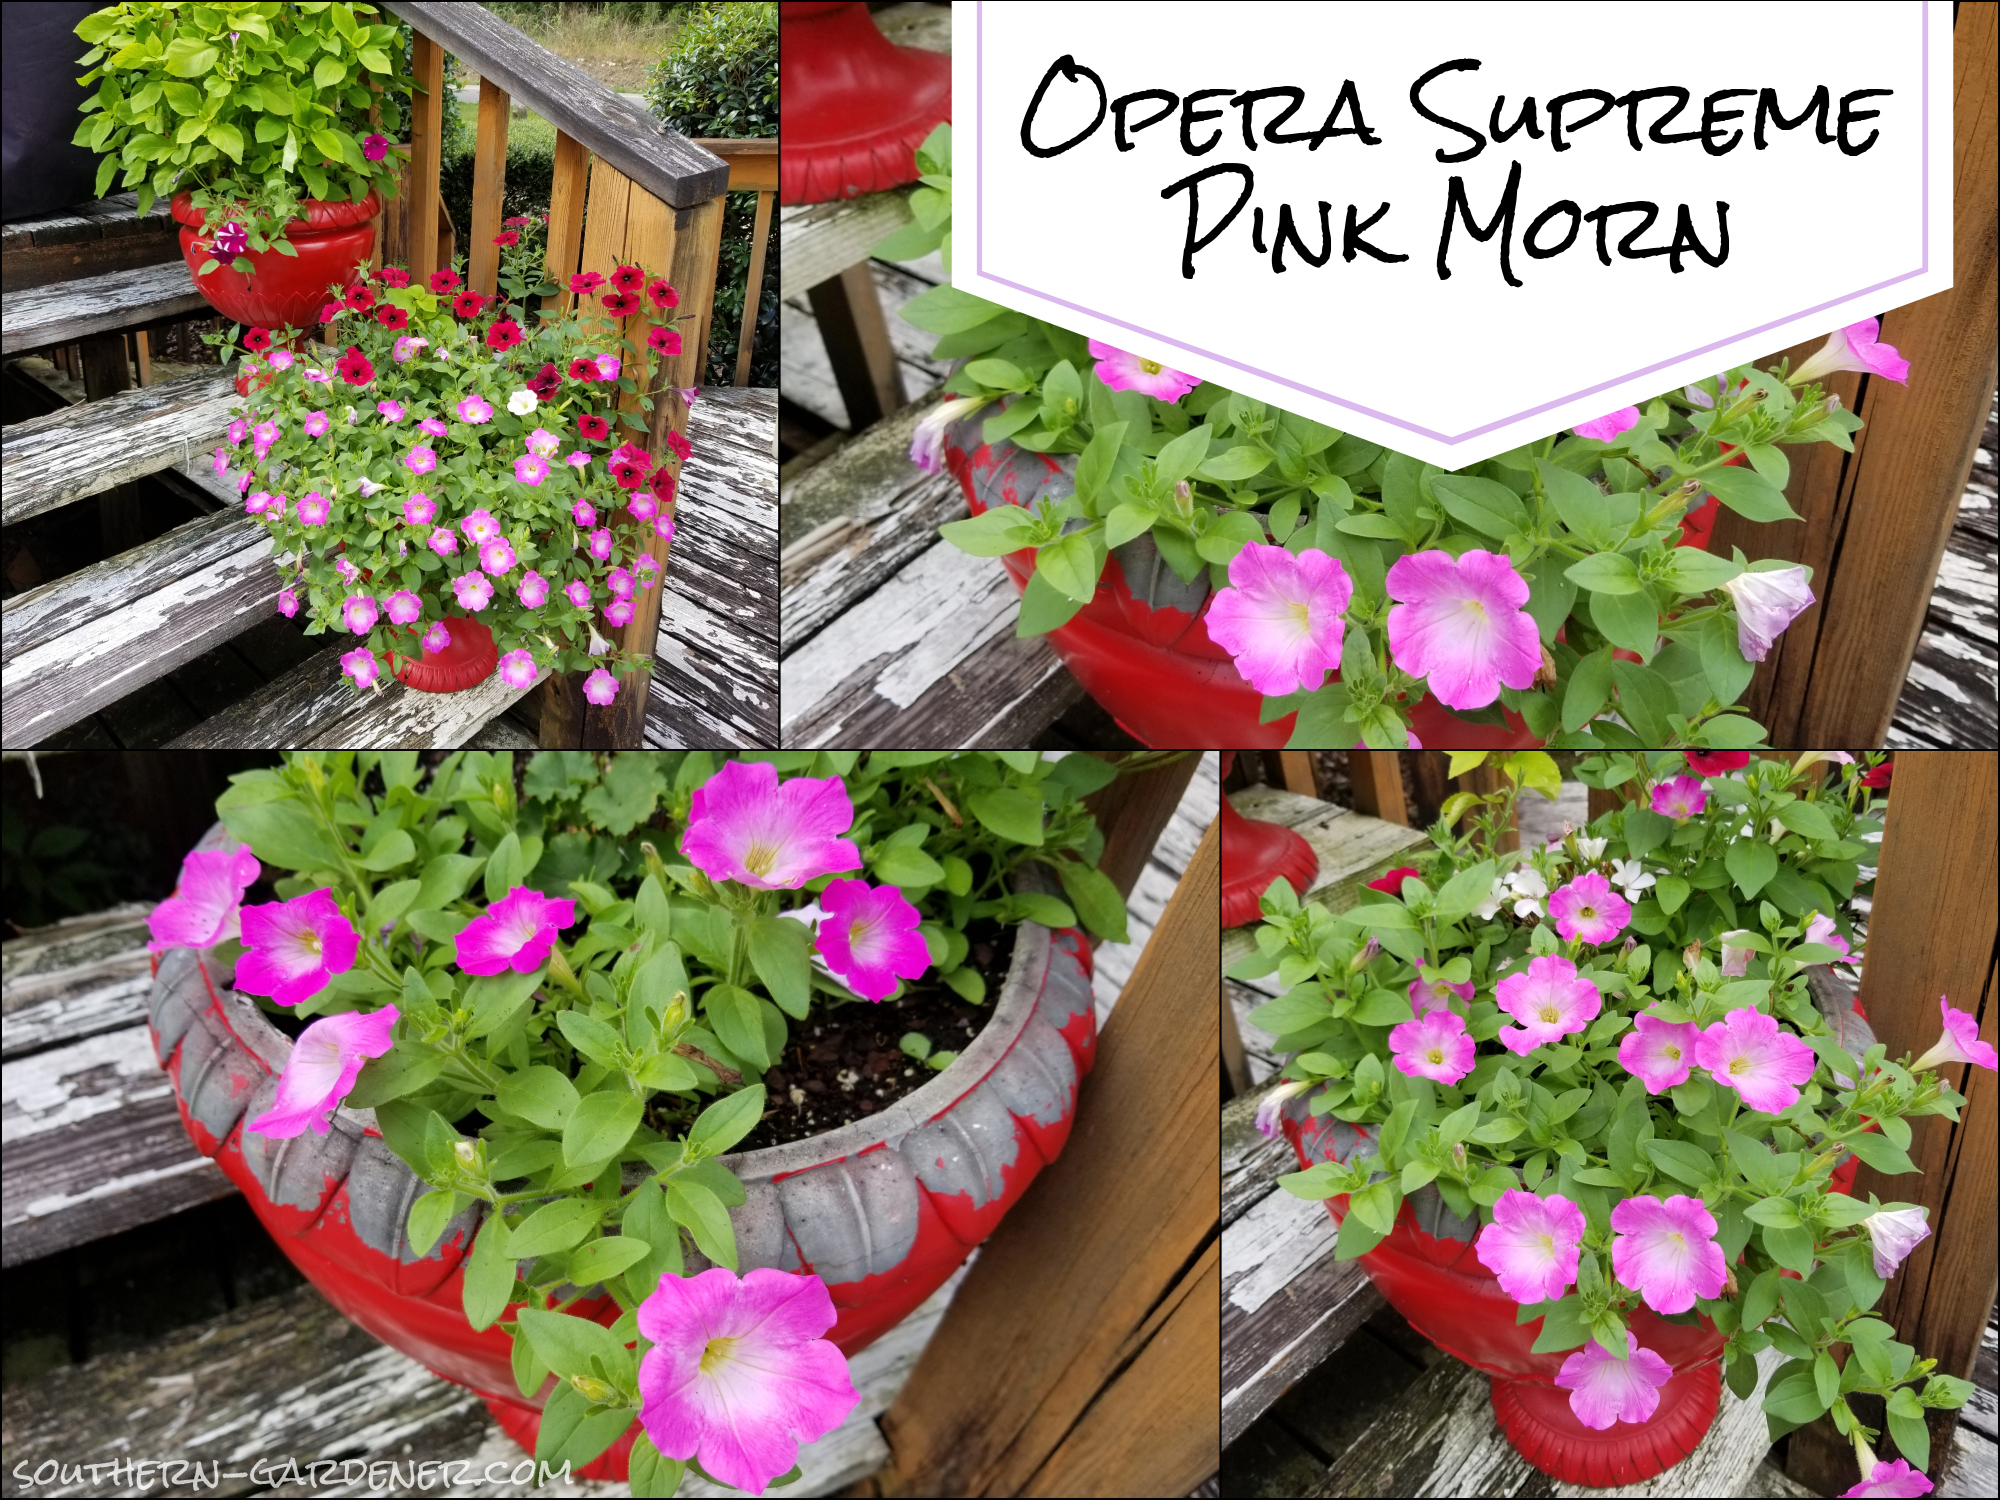 Opera Supreme Pink Morn Petunias